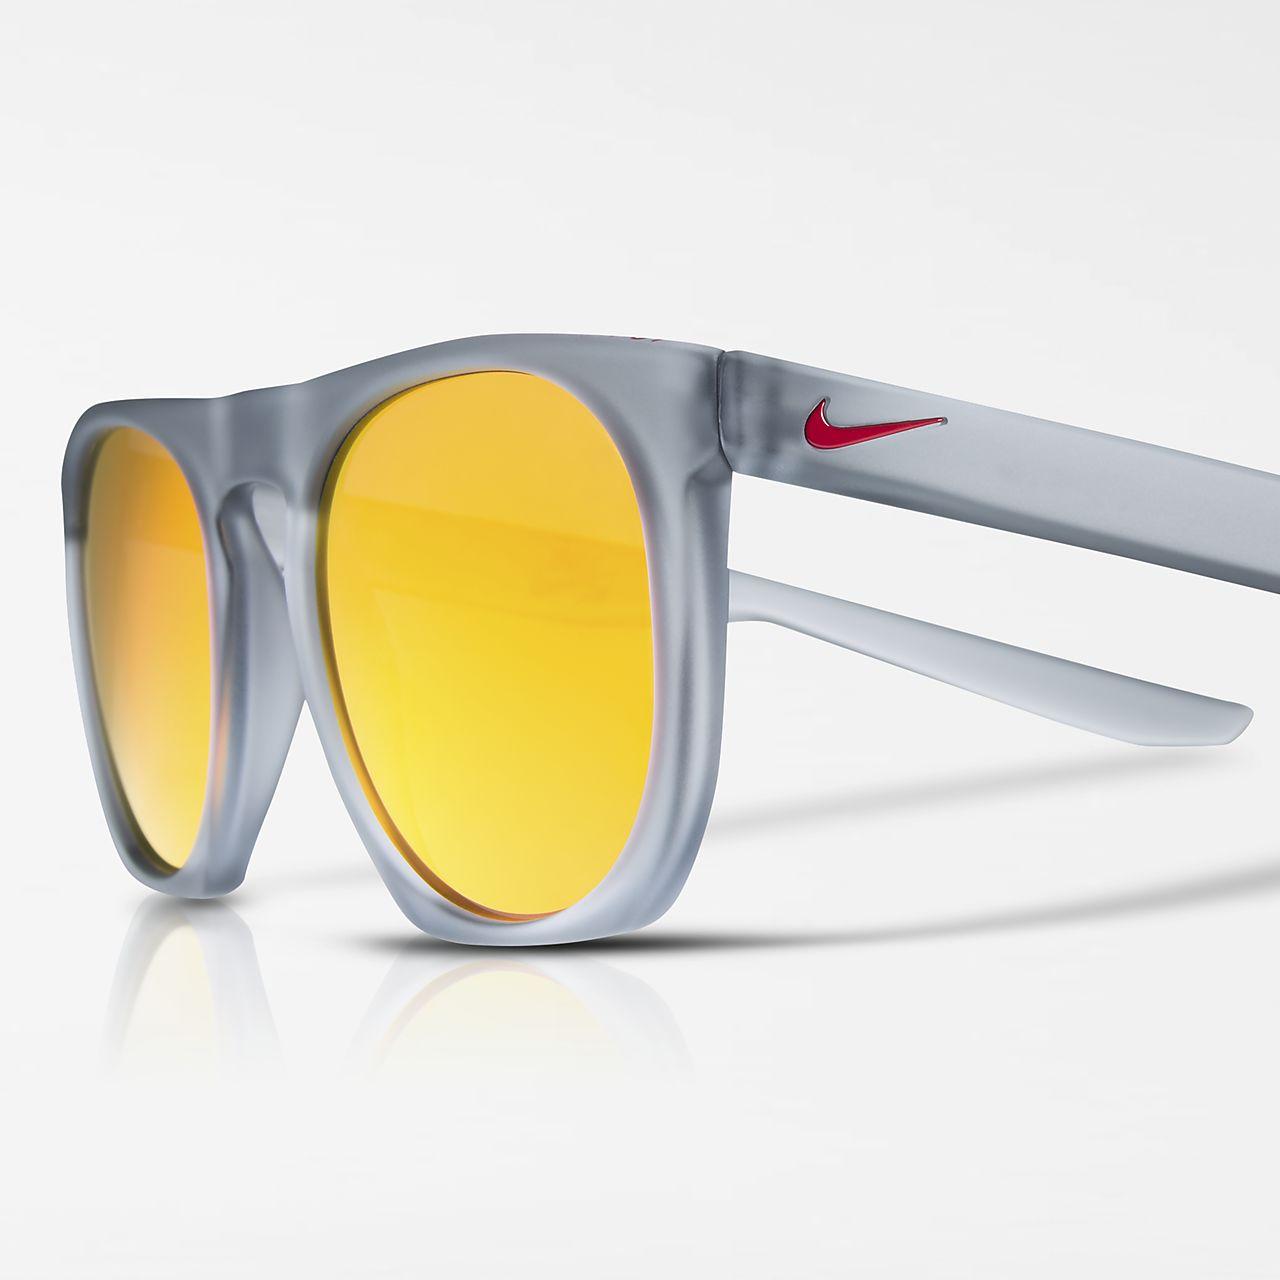 Nike Flatspot Mirrored Sunglasses